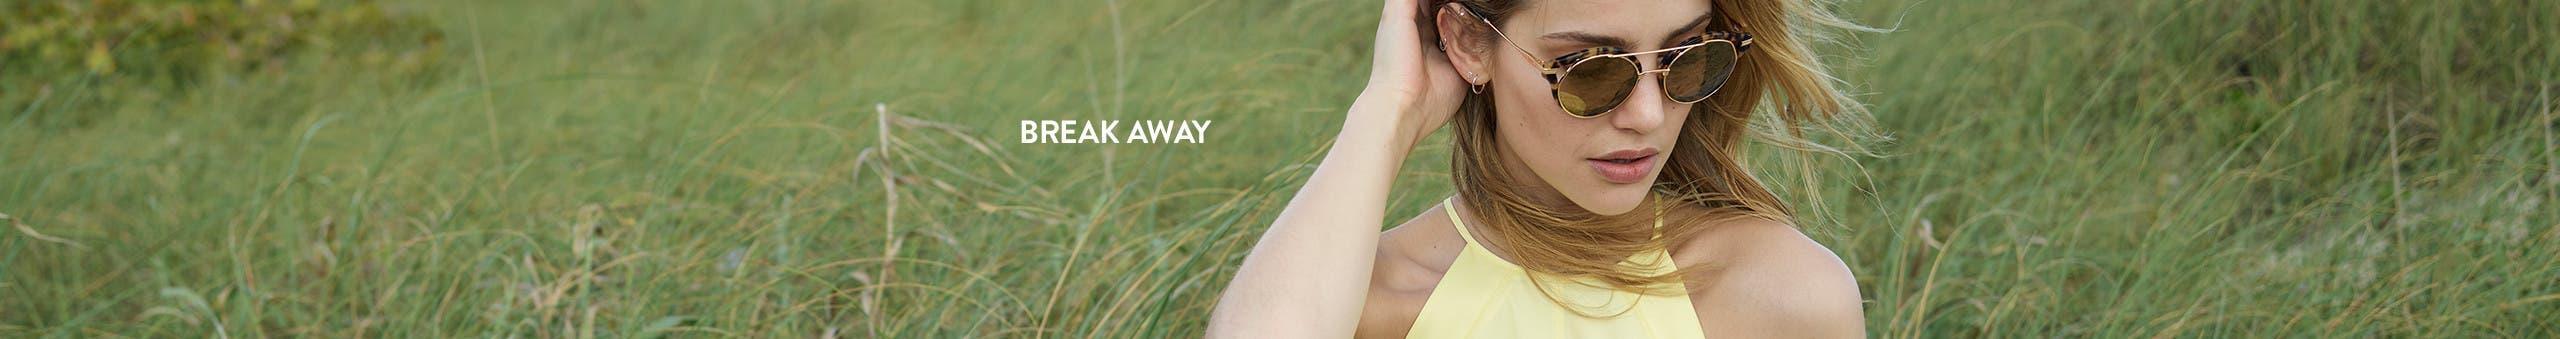 Break away.